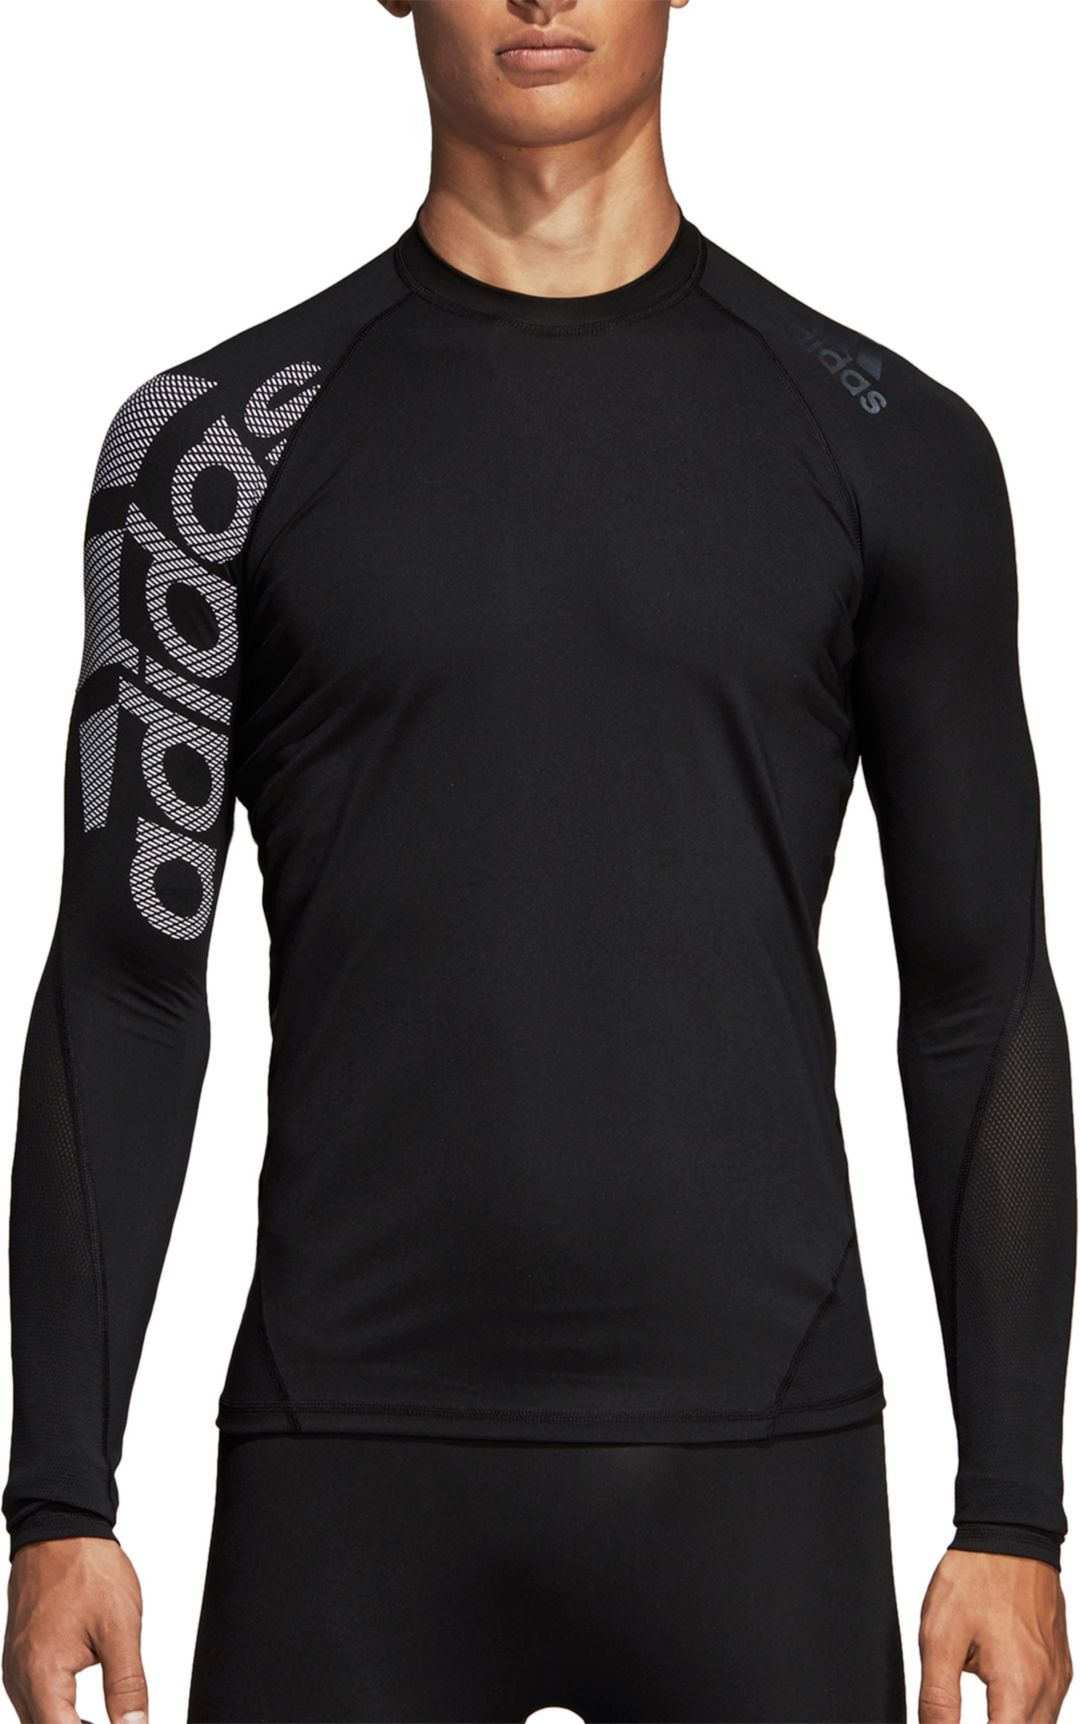 57a1a193 adidas Men's Alphaskin Badge of Sport Logo Compression Long Sleeve Shirt 1